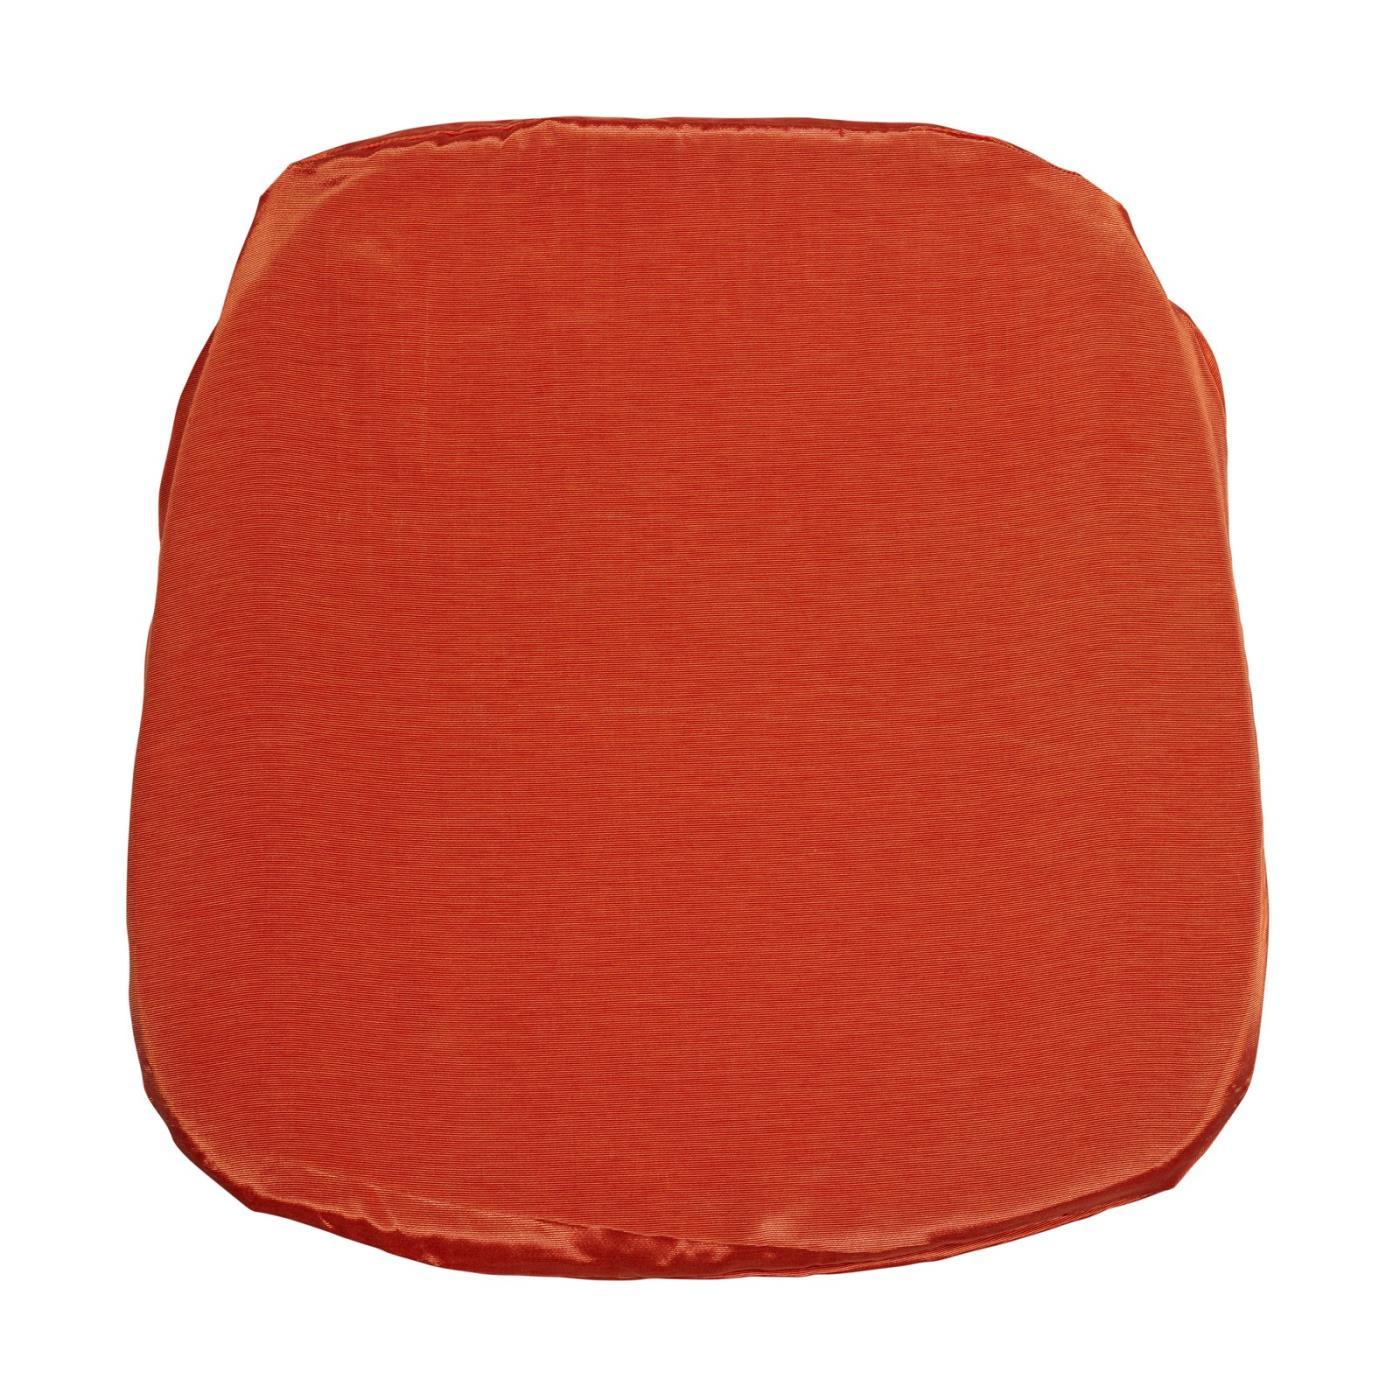 Bengaline Seat Cushion - Tangerine